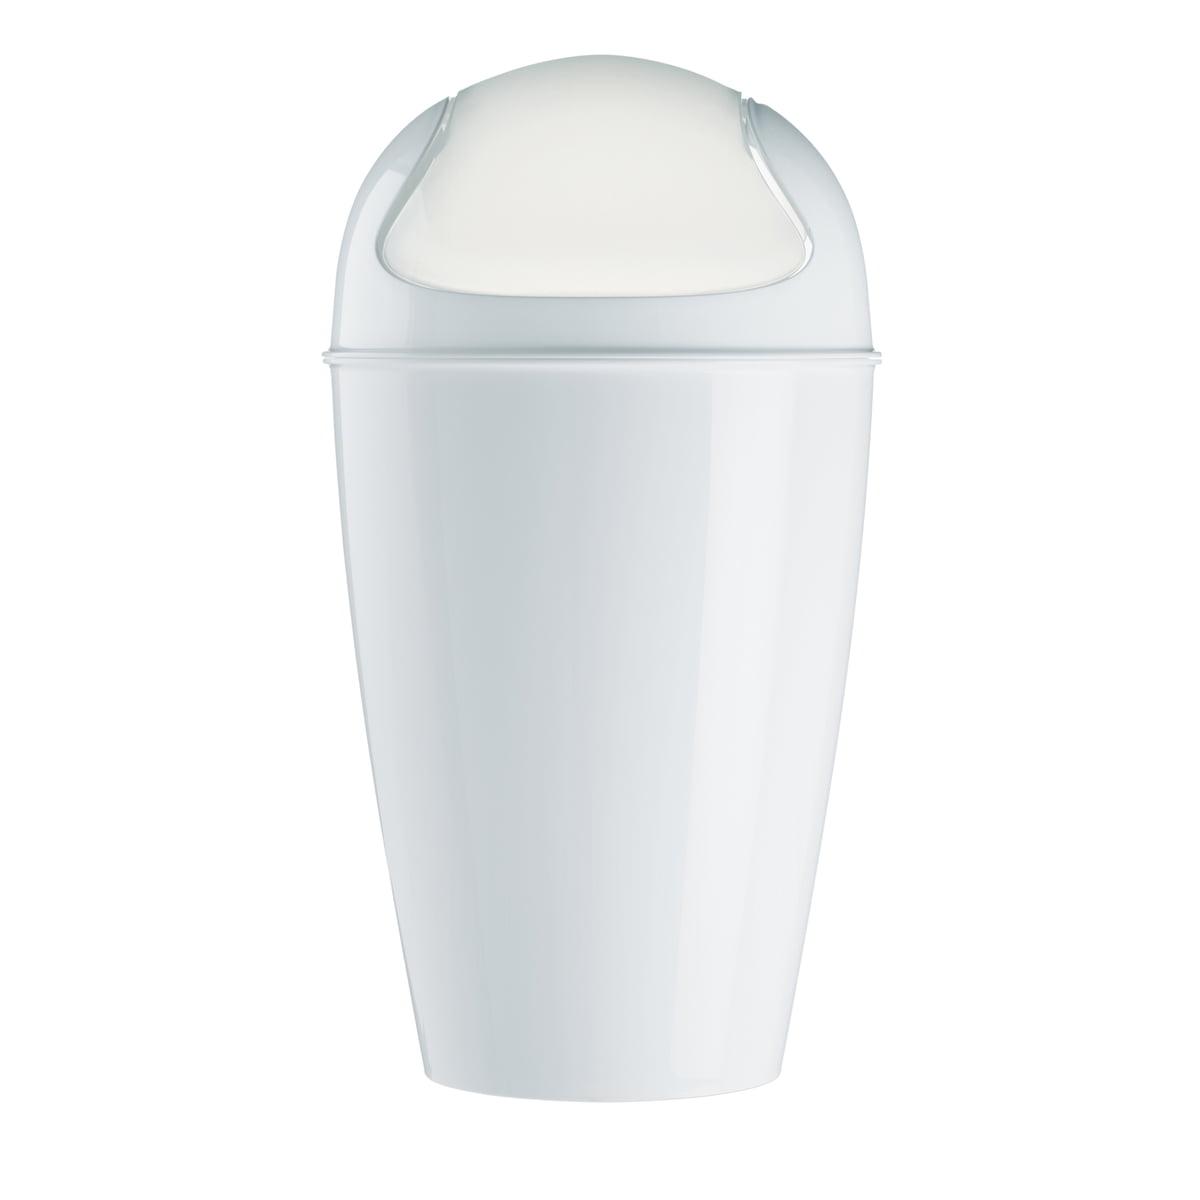 Koziol  Del Xl Dustbin With Swinging Lid, 30 L, White